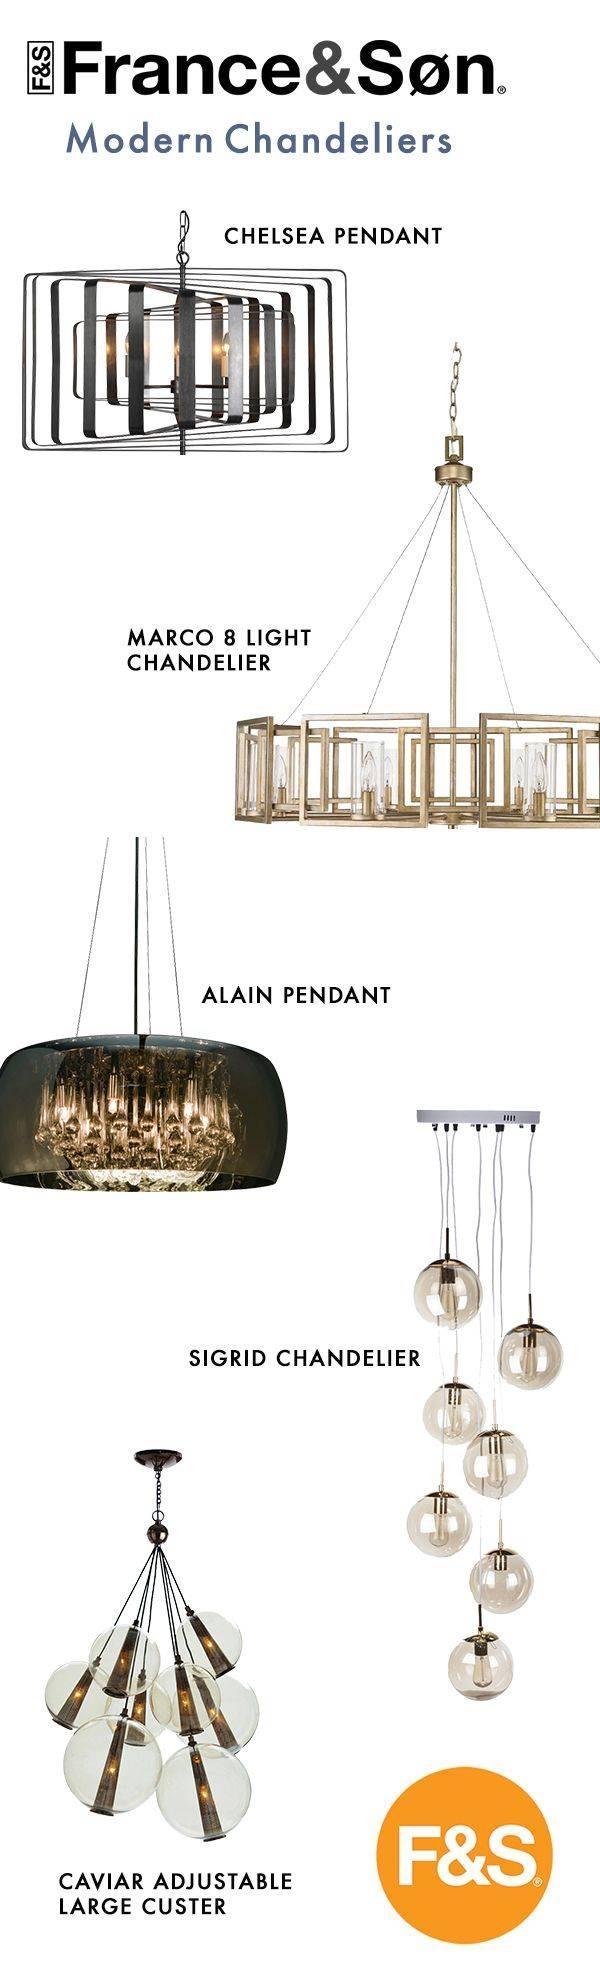 2071 Best The Light Fantastic Images On Pinterest | Home inside Caviar Lights Fixtures (Image 1 of 15)